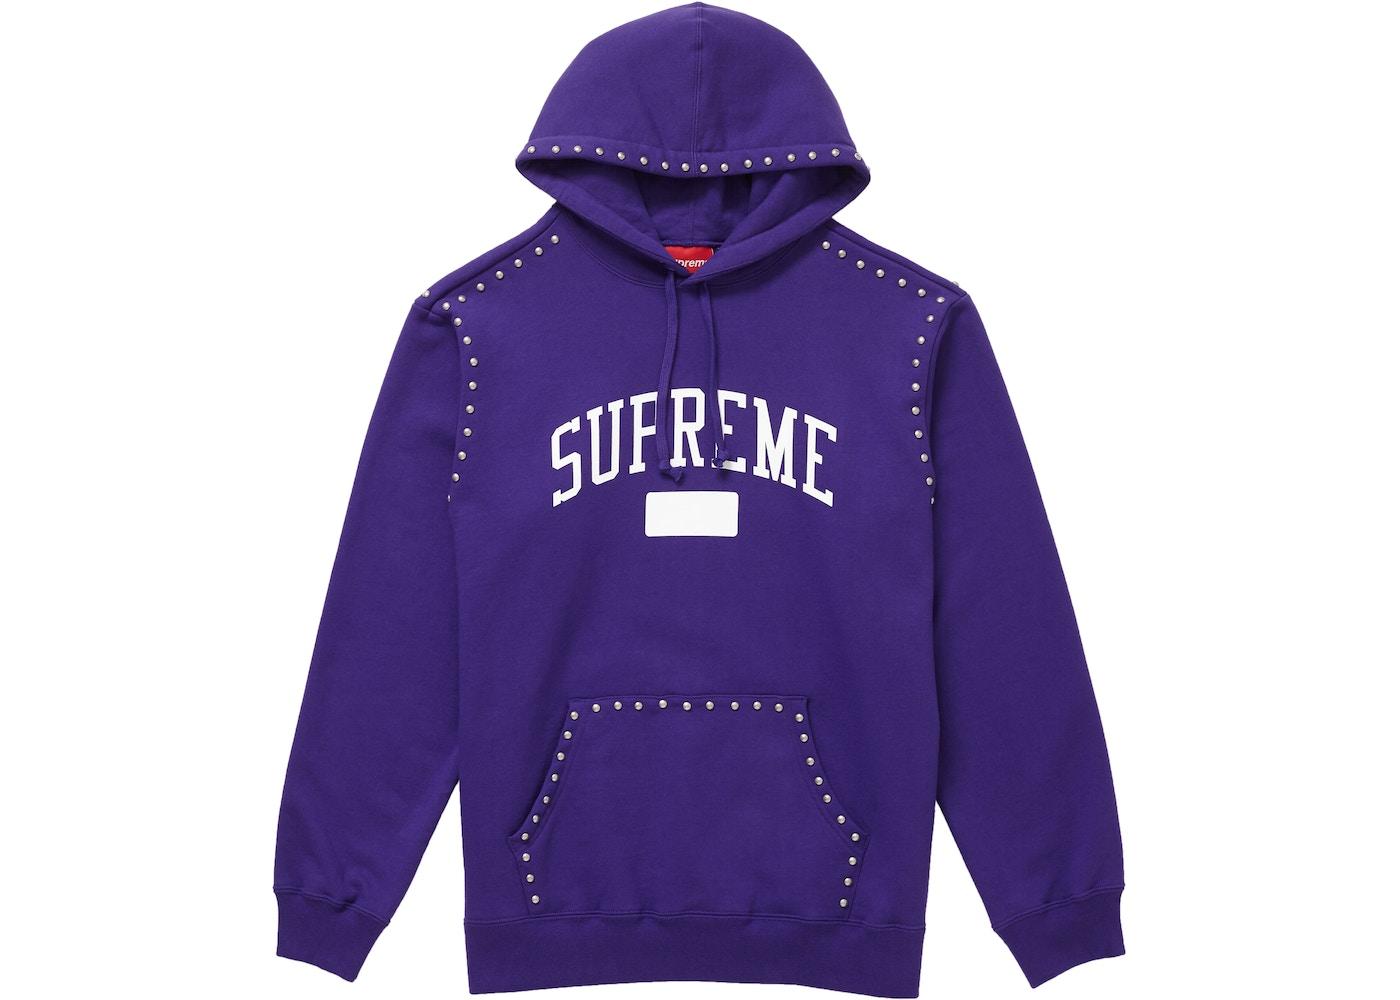 90f130bf8311 Supreme Studded Hooded Sweatshirt (FW18) Purple - FW18